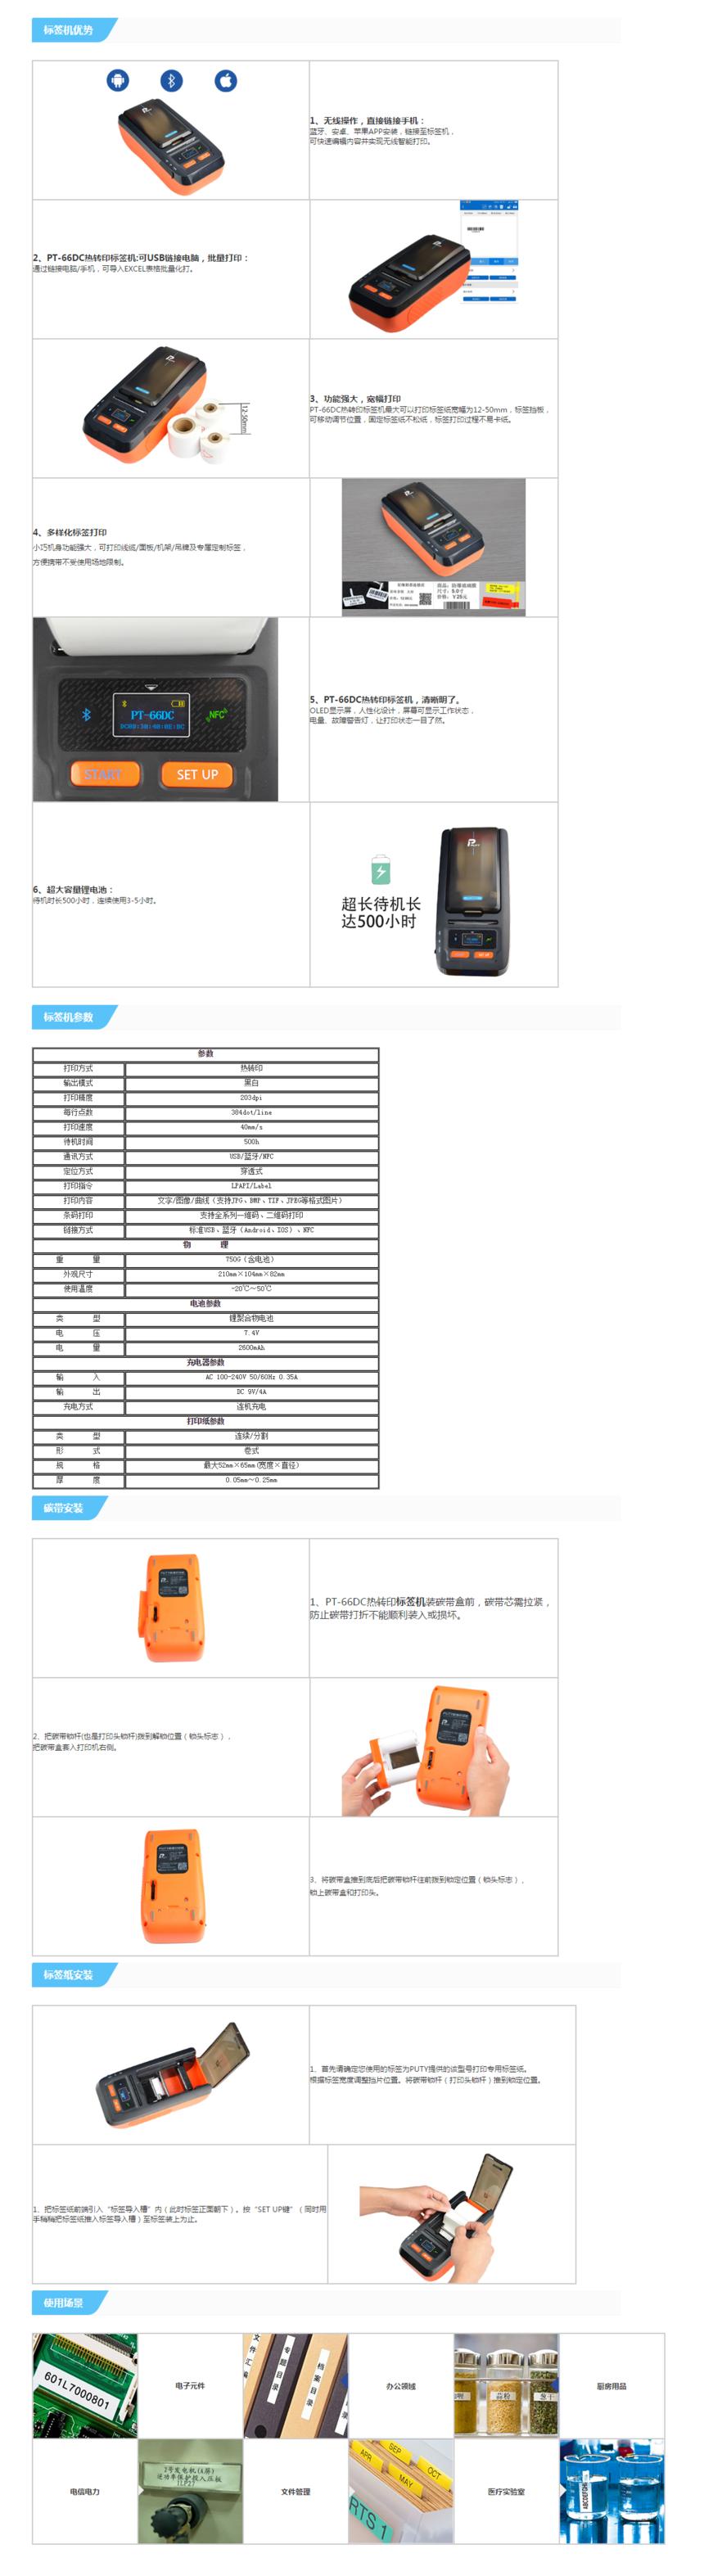 PT-66DC热转印标签机_普贴科技PUTY官方网站.png